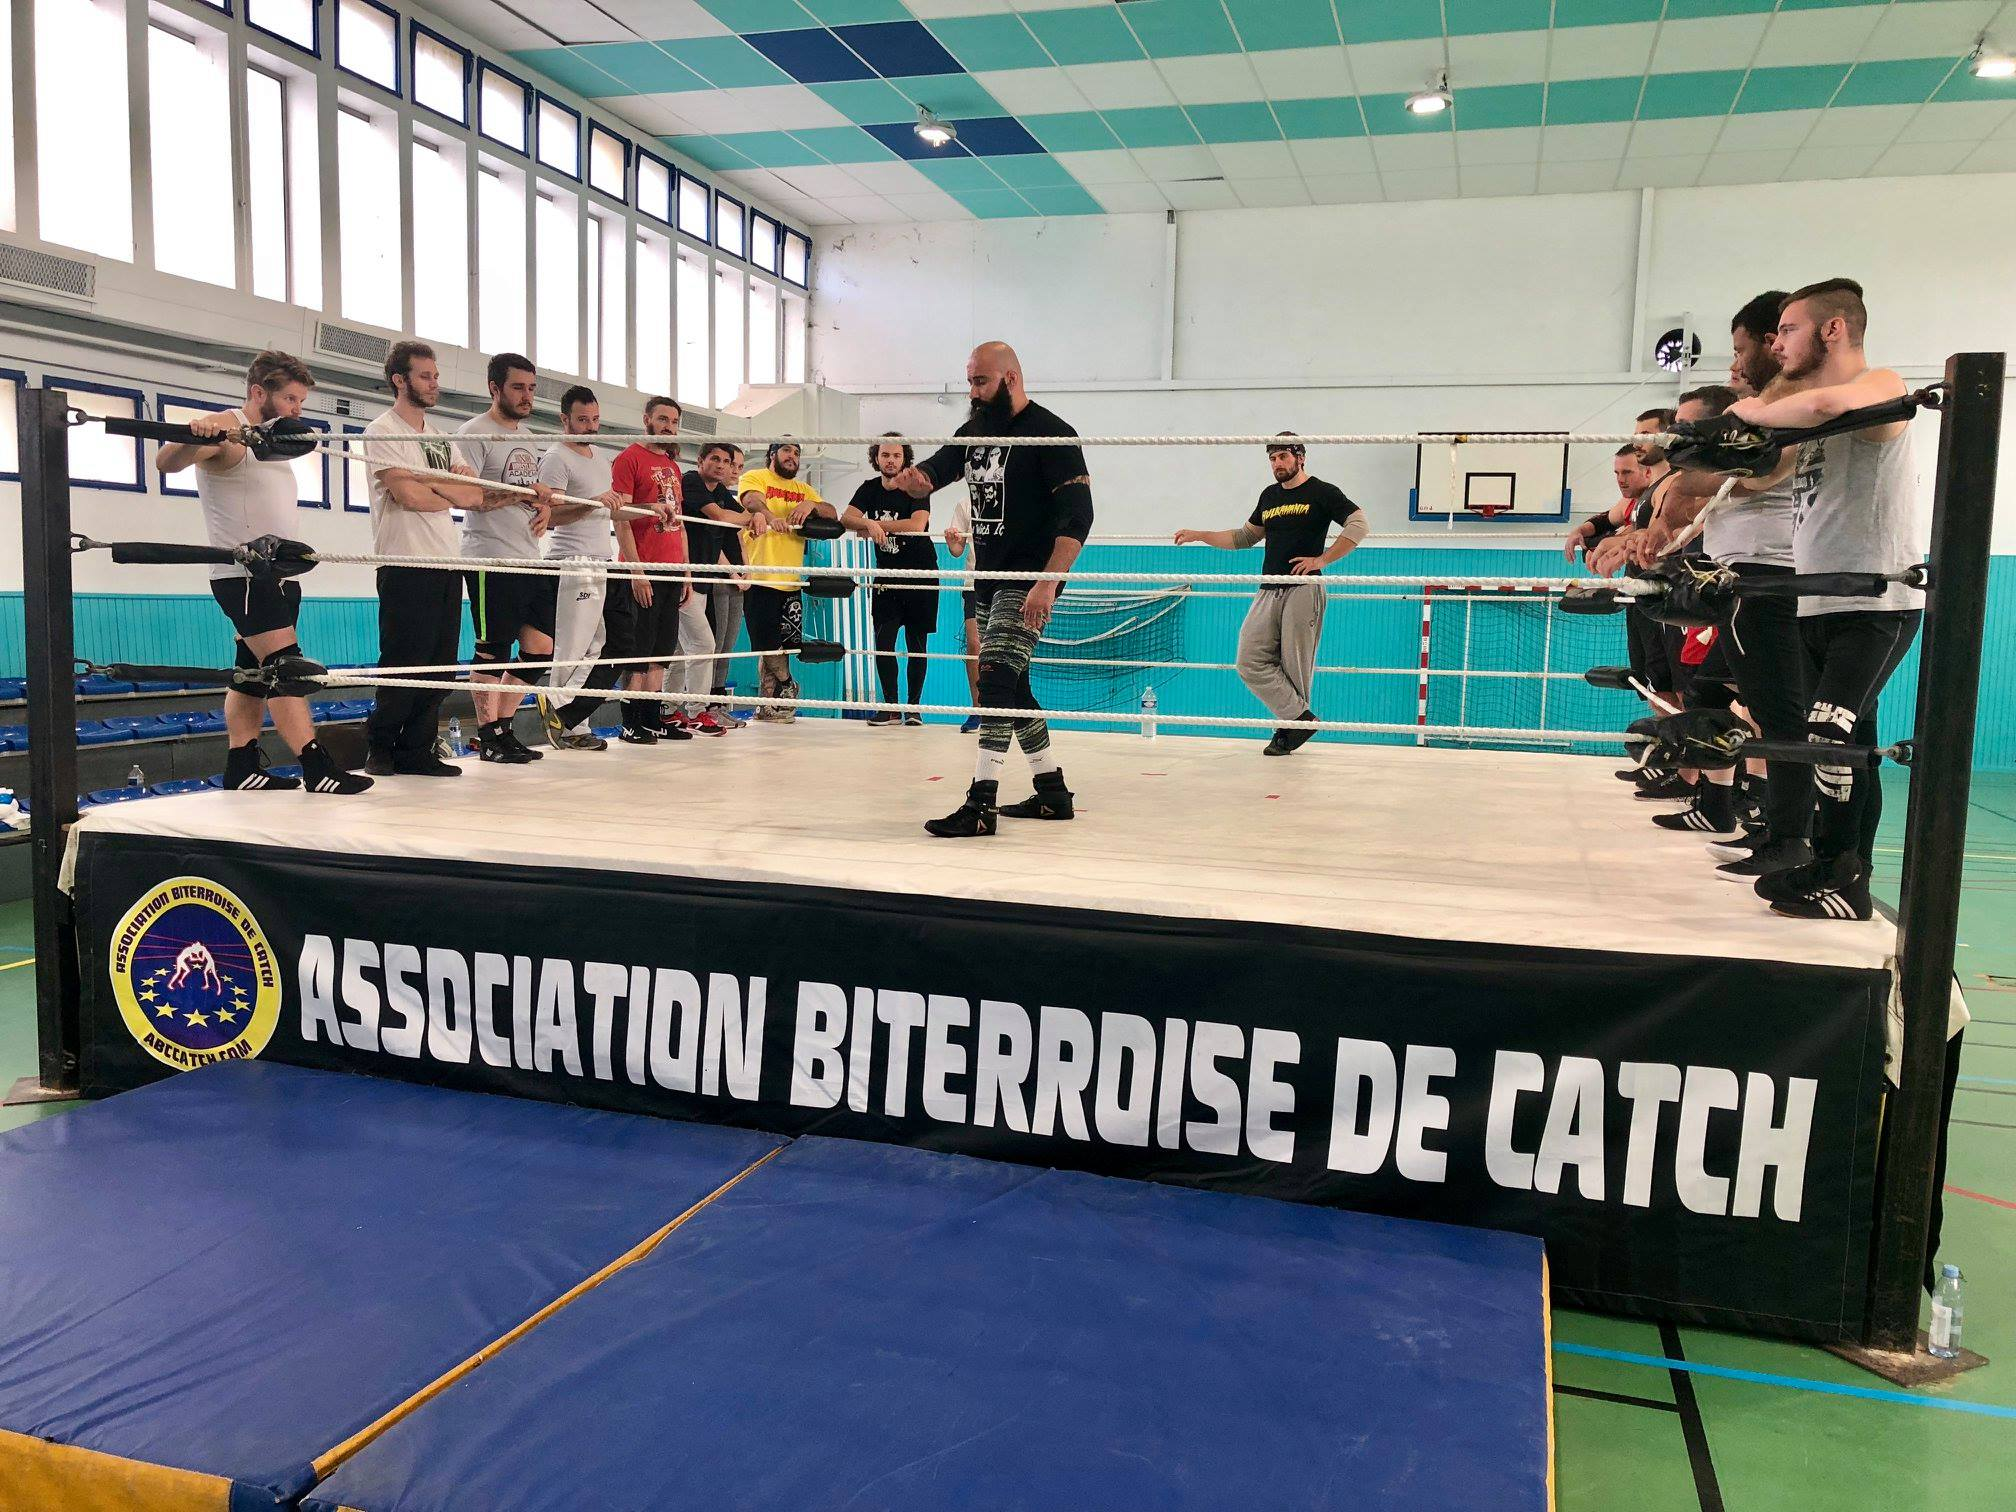 association biterroise de catch stage catch Béziers tom la ruffa